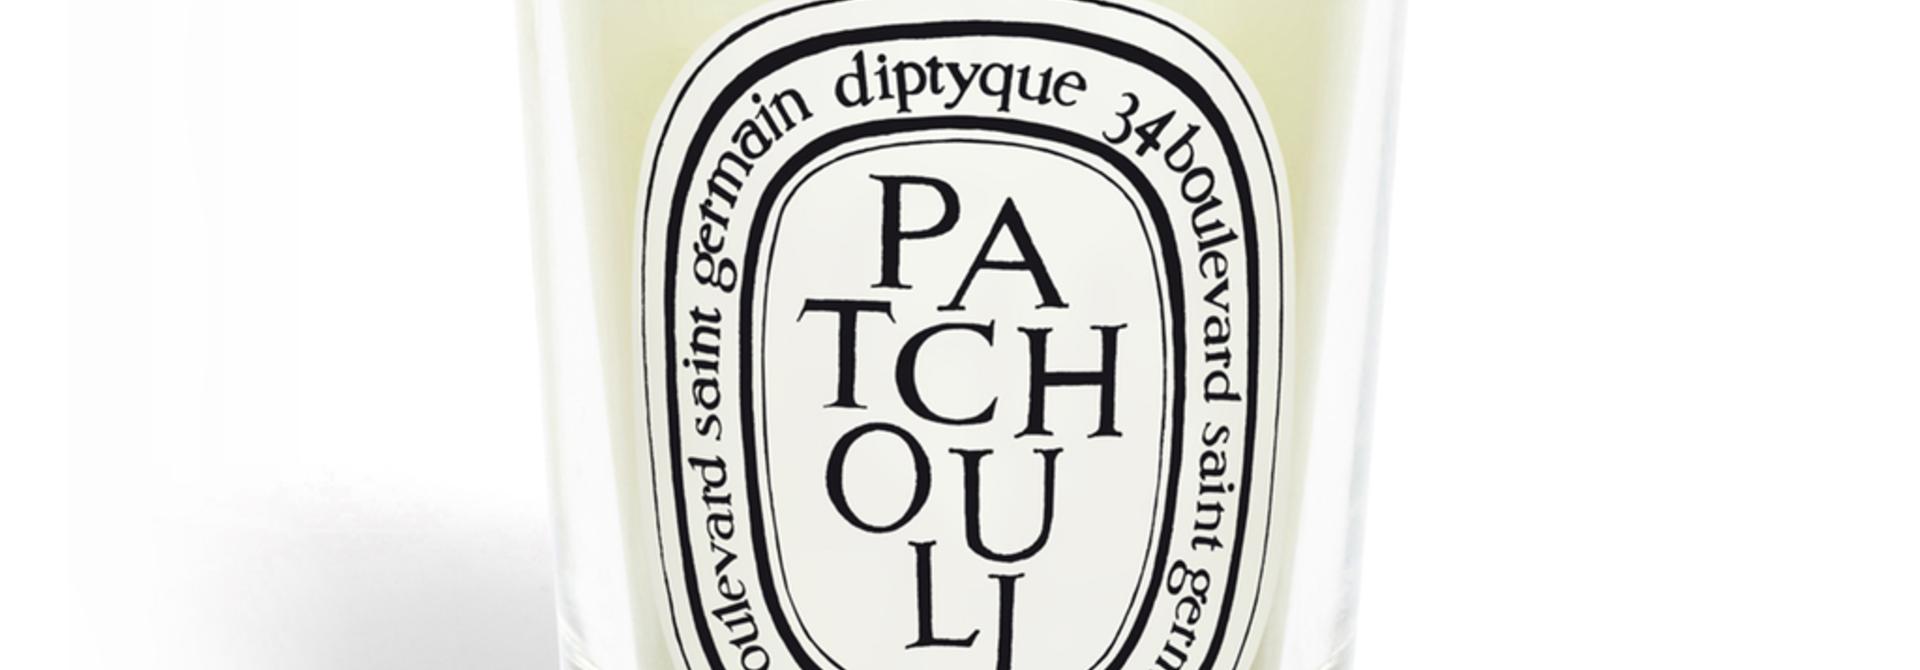 DIPTYQUE - Bougie Patchouli 190gr